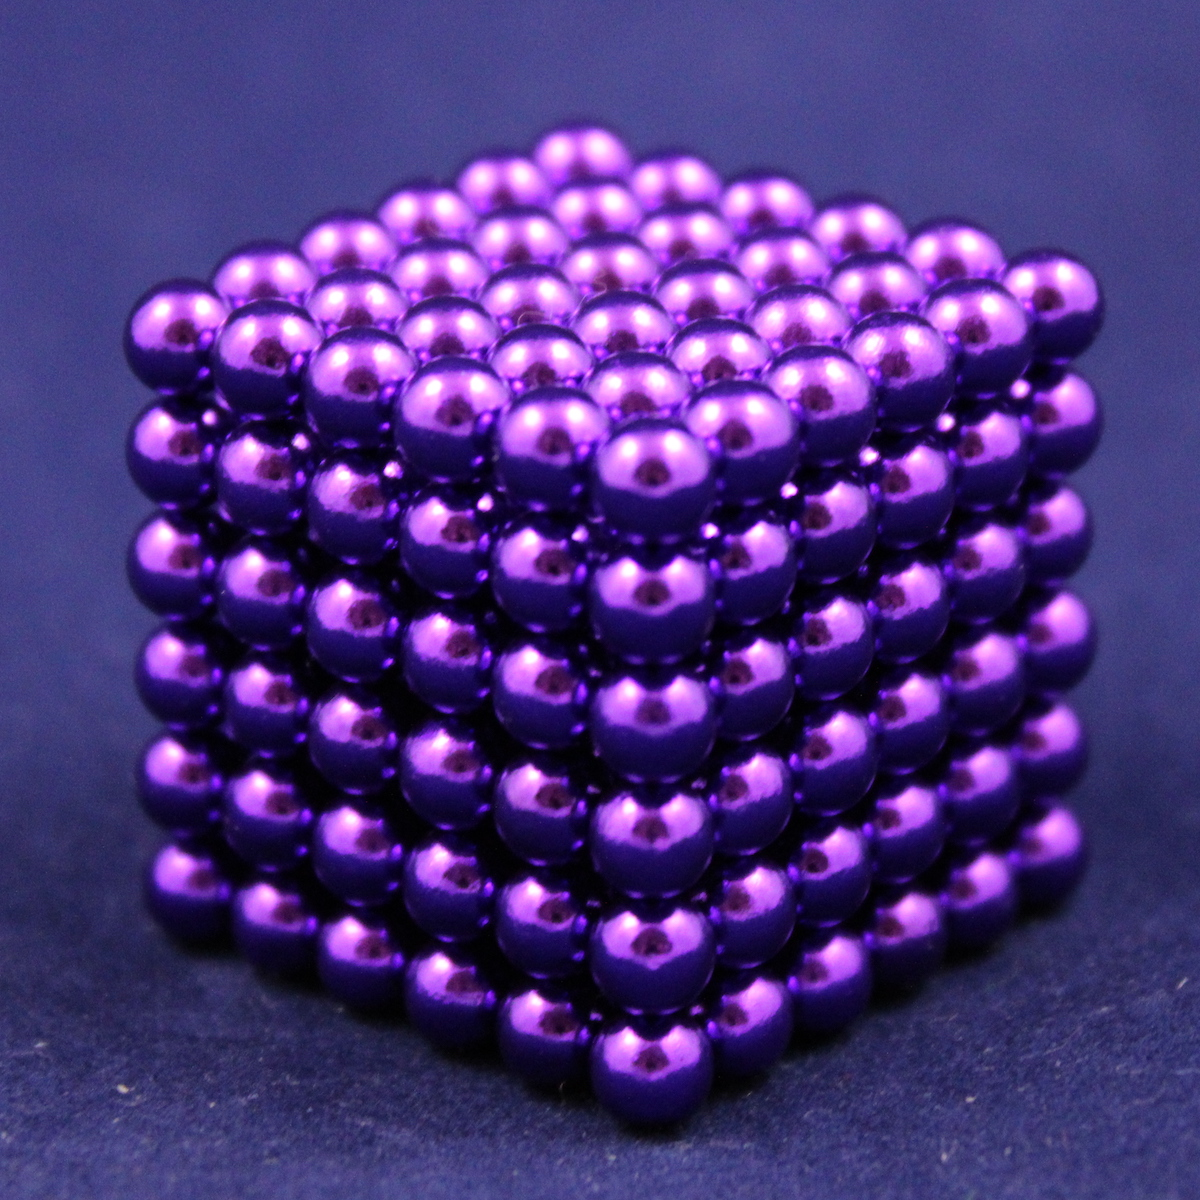 violett Neocube 216 Magnet Würfel Neodym Kugelmagnet DI... Neo Ball Cube 5mm